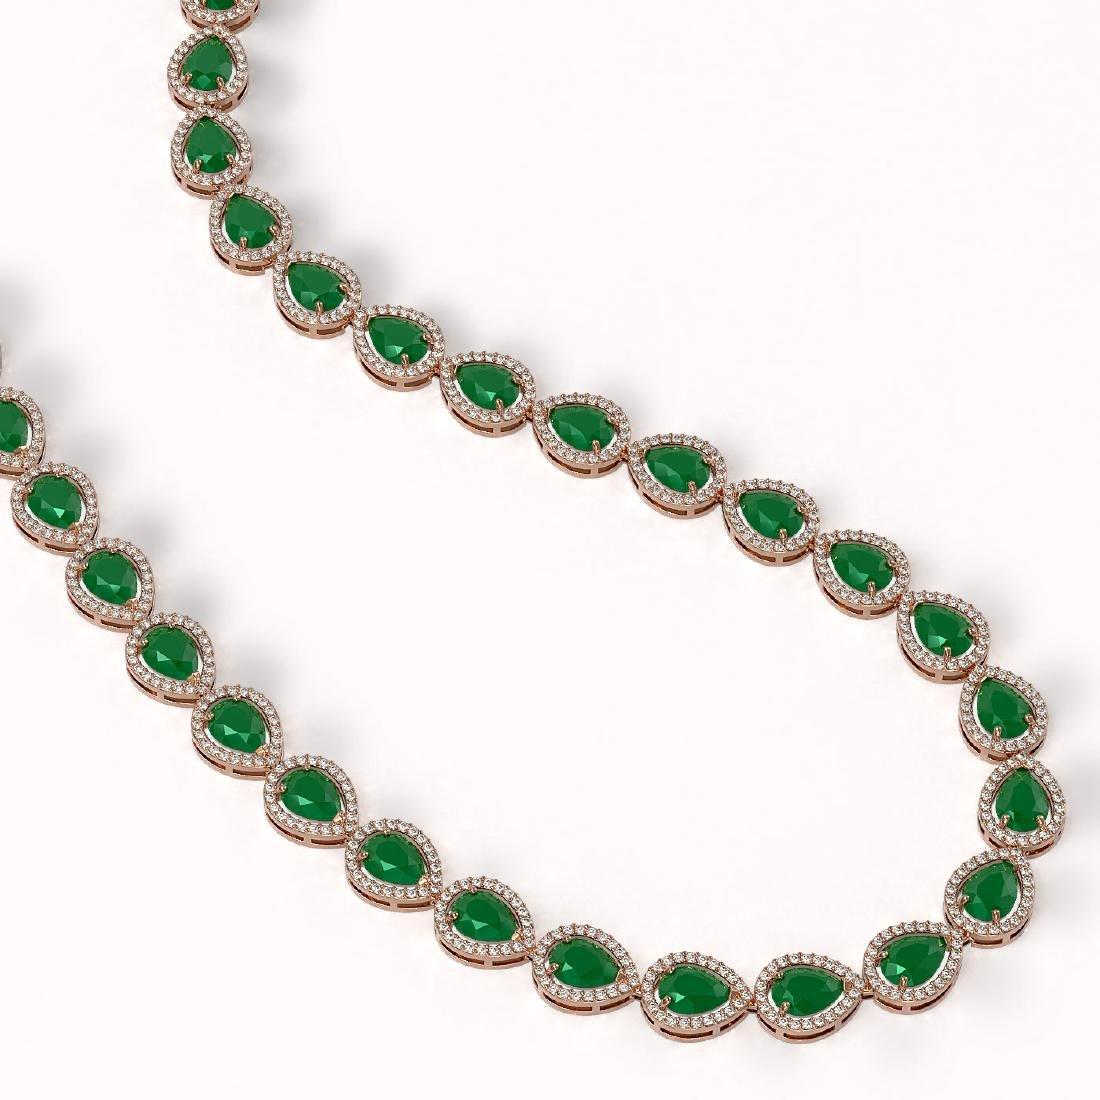 45.93 CTW Emerald & Diamond Halo Necklace 10K Rose Gold - 2